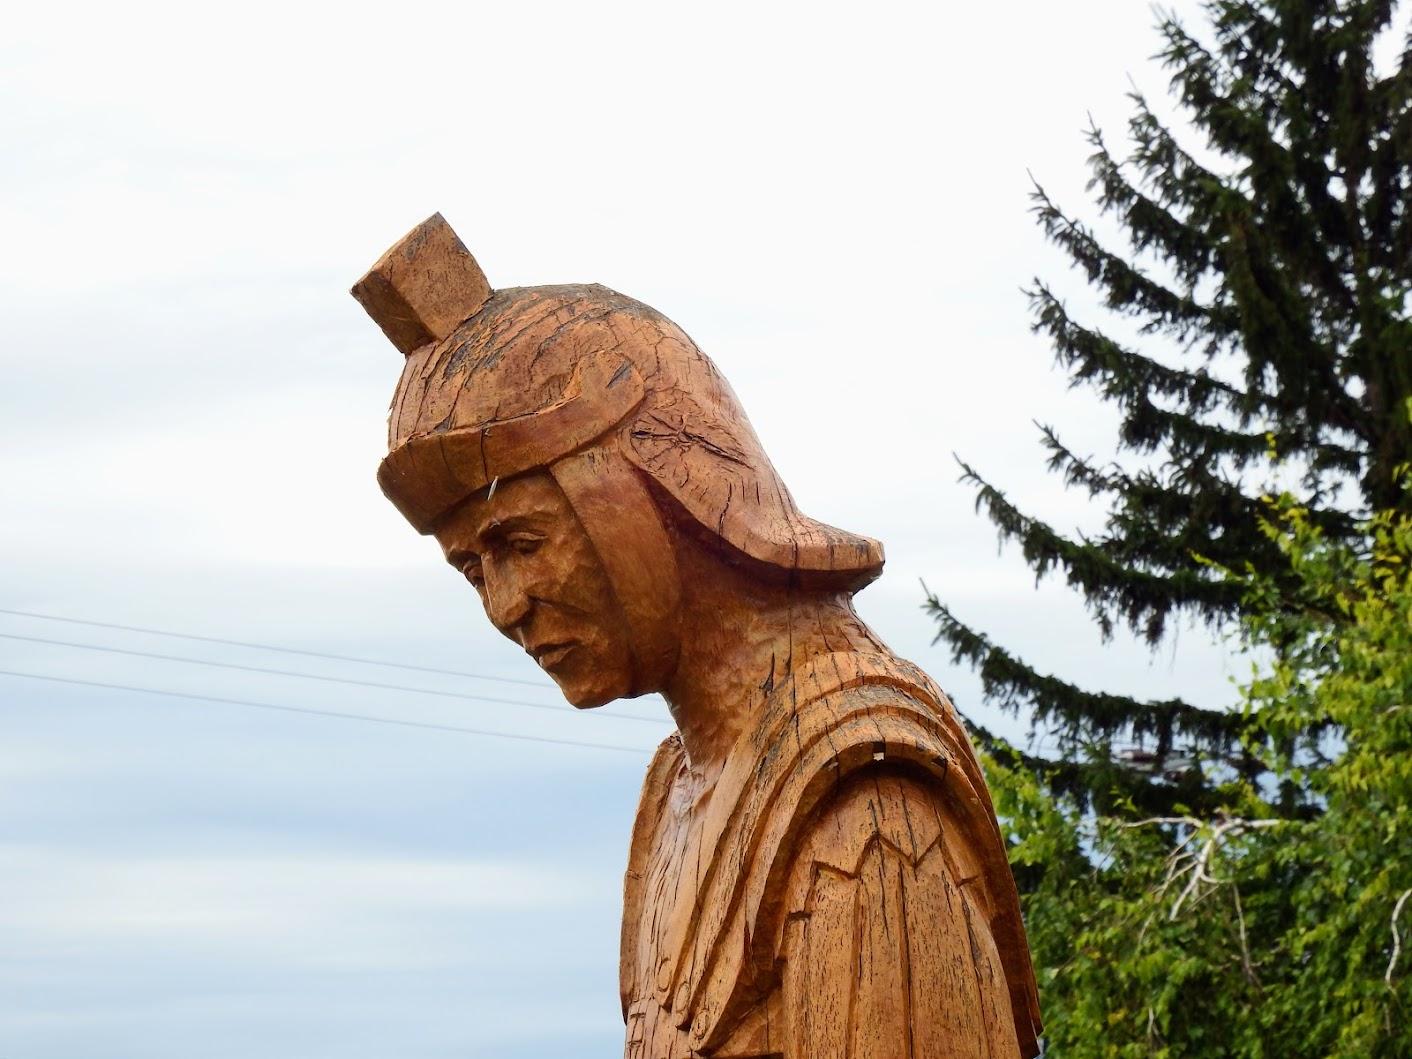 Vonyarcvashegy - Római katona szobra